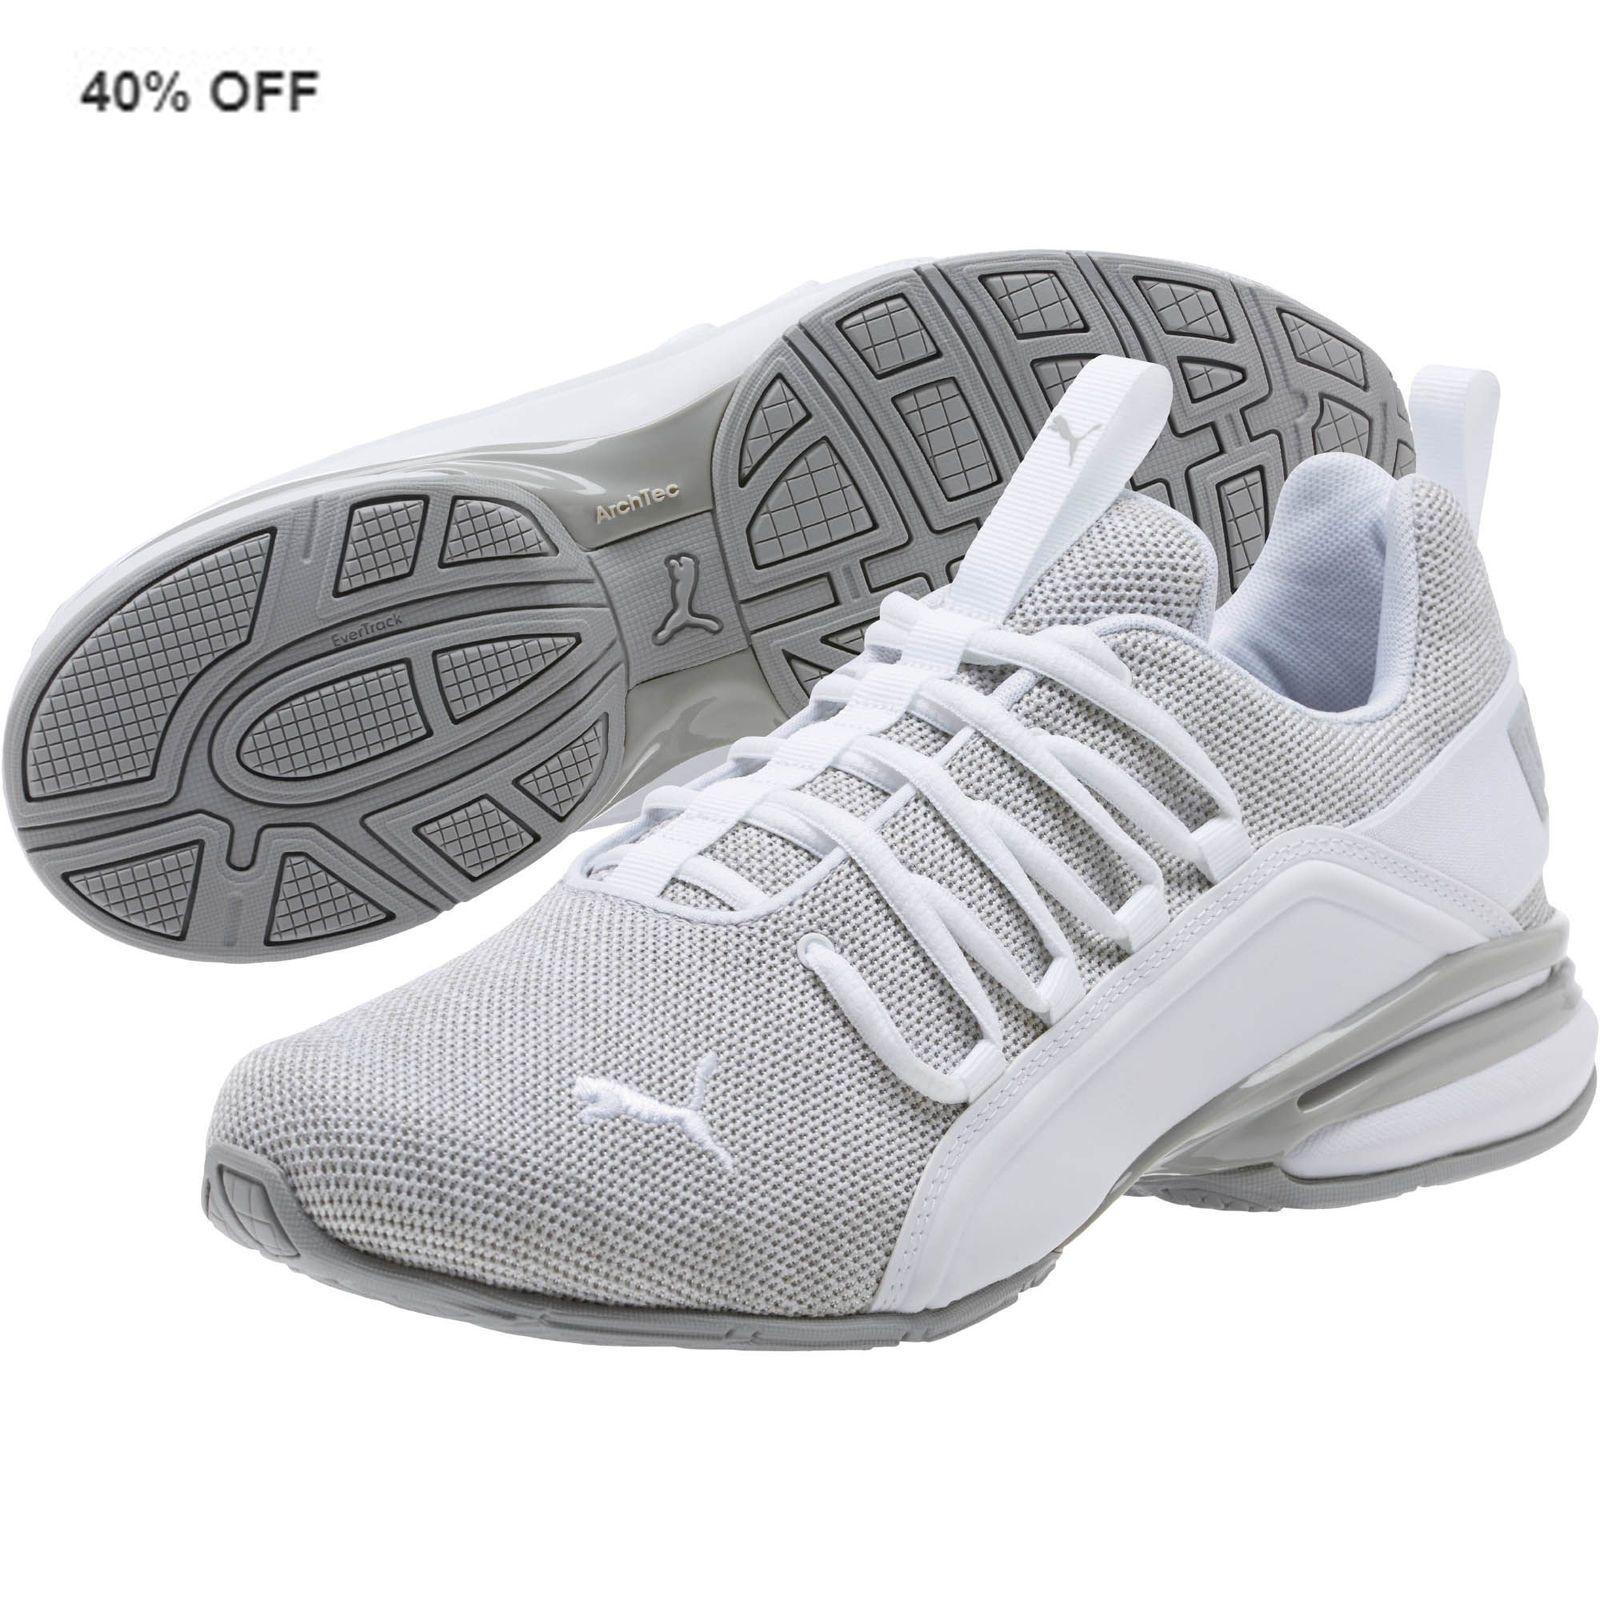 PUMA Axelion Men's Sneakers Men Shoe